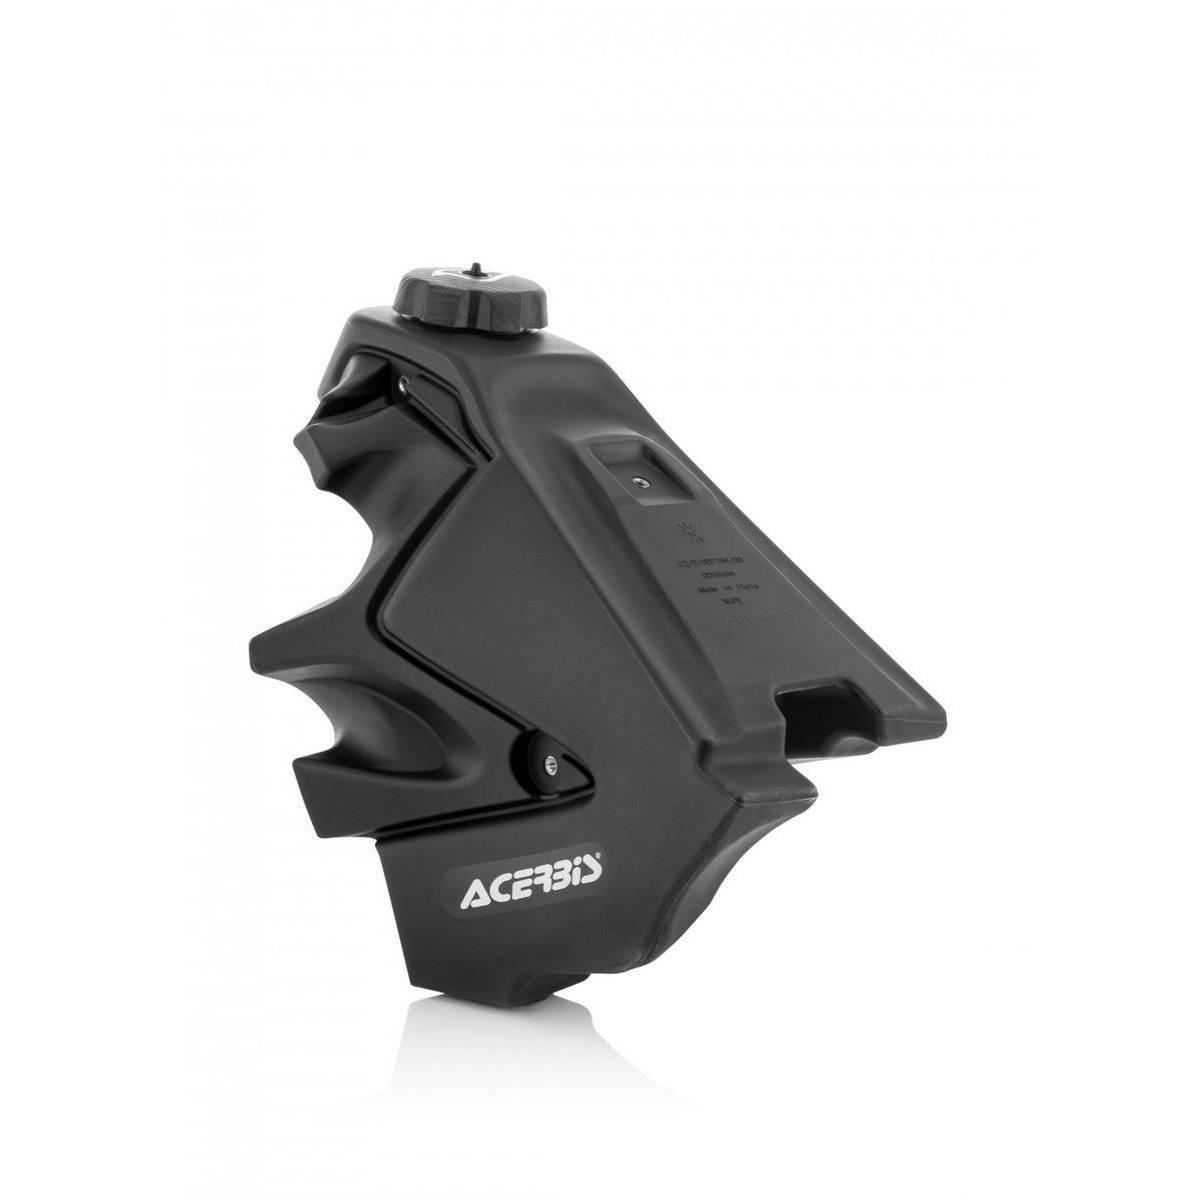 0016494-090 - Deposito Acerbis Yamaha Yz 85 07 17 8.5 Litros Negro